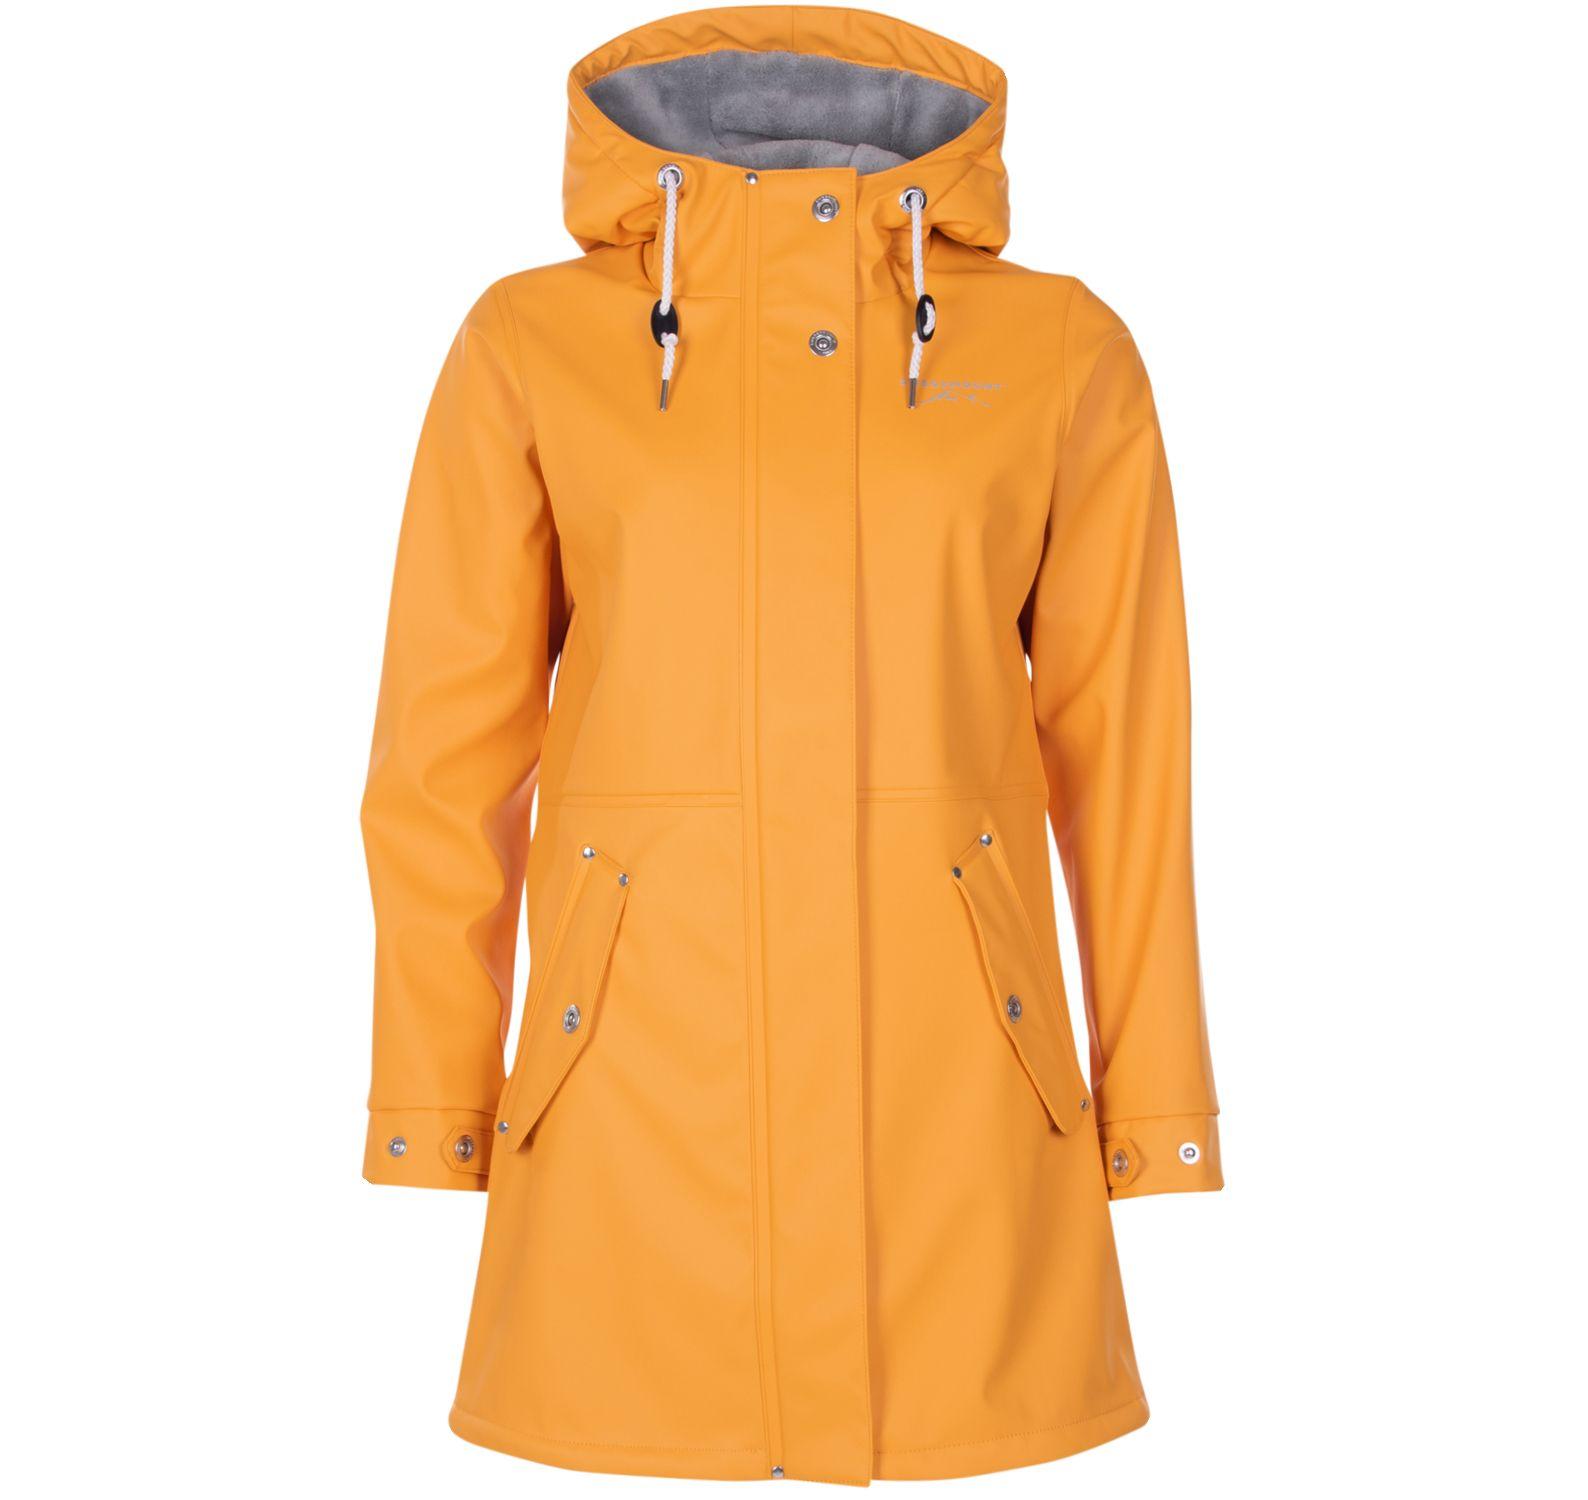 Lammö Coat W, Mustard Yellow, 34, Regnkläder